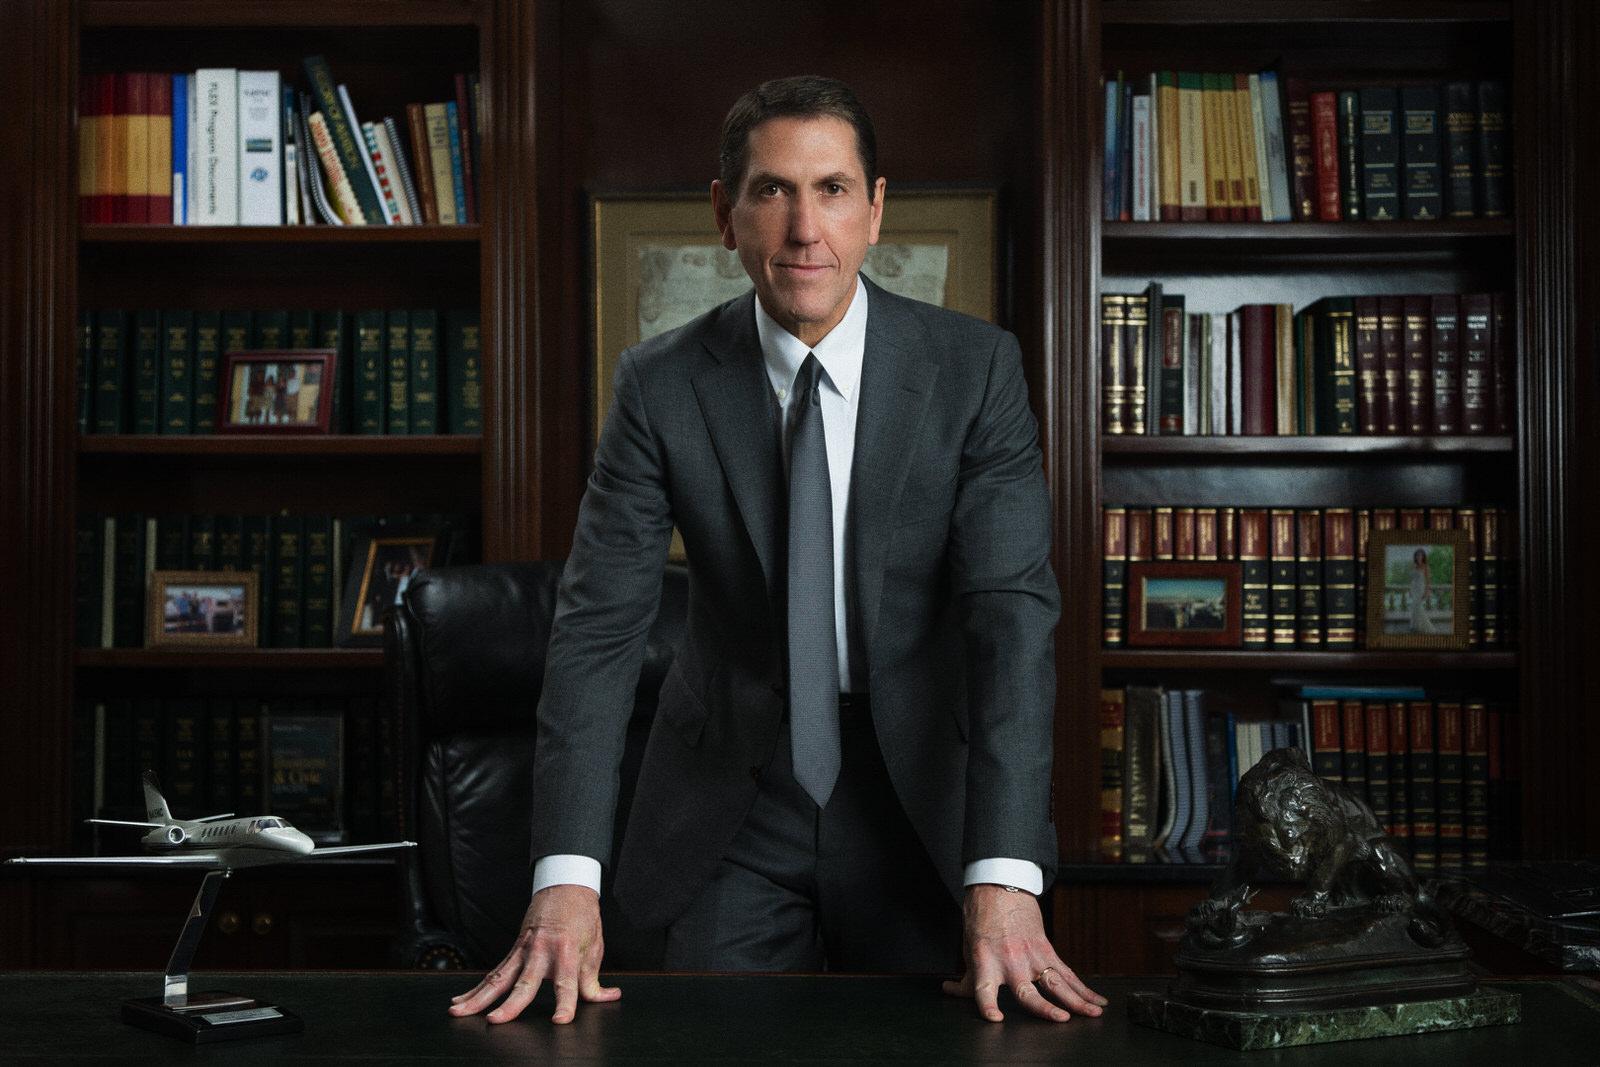 Executive business portraits photography for John Cheadle